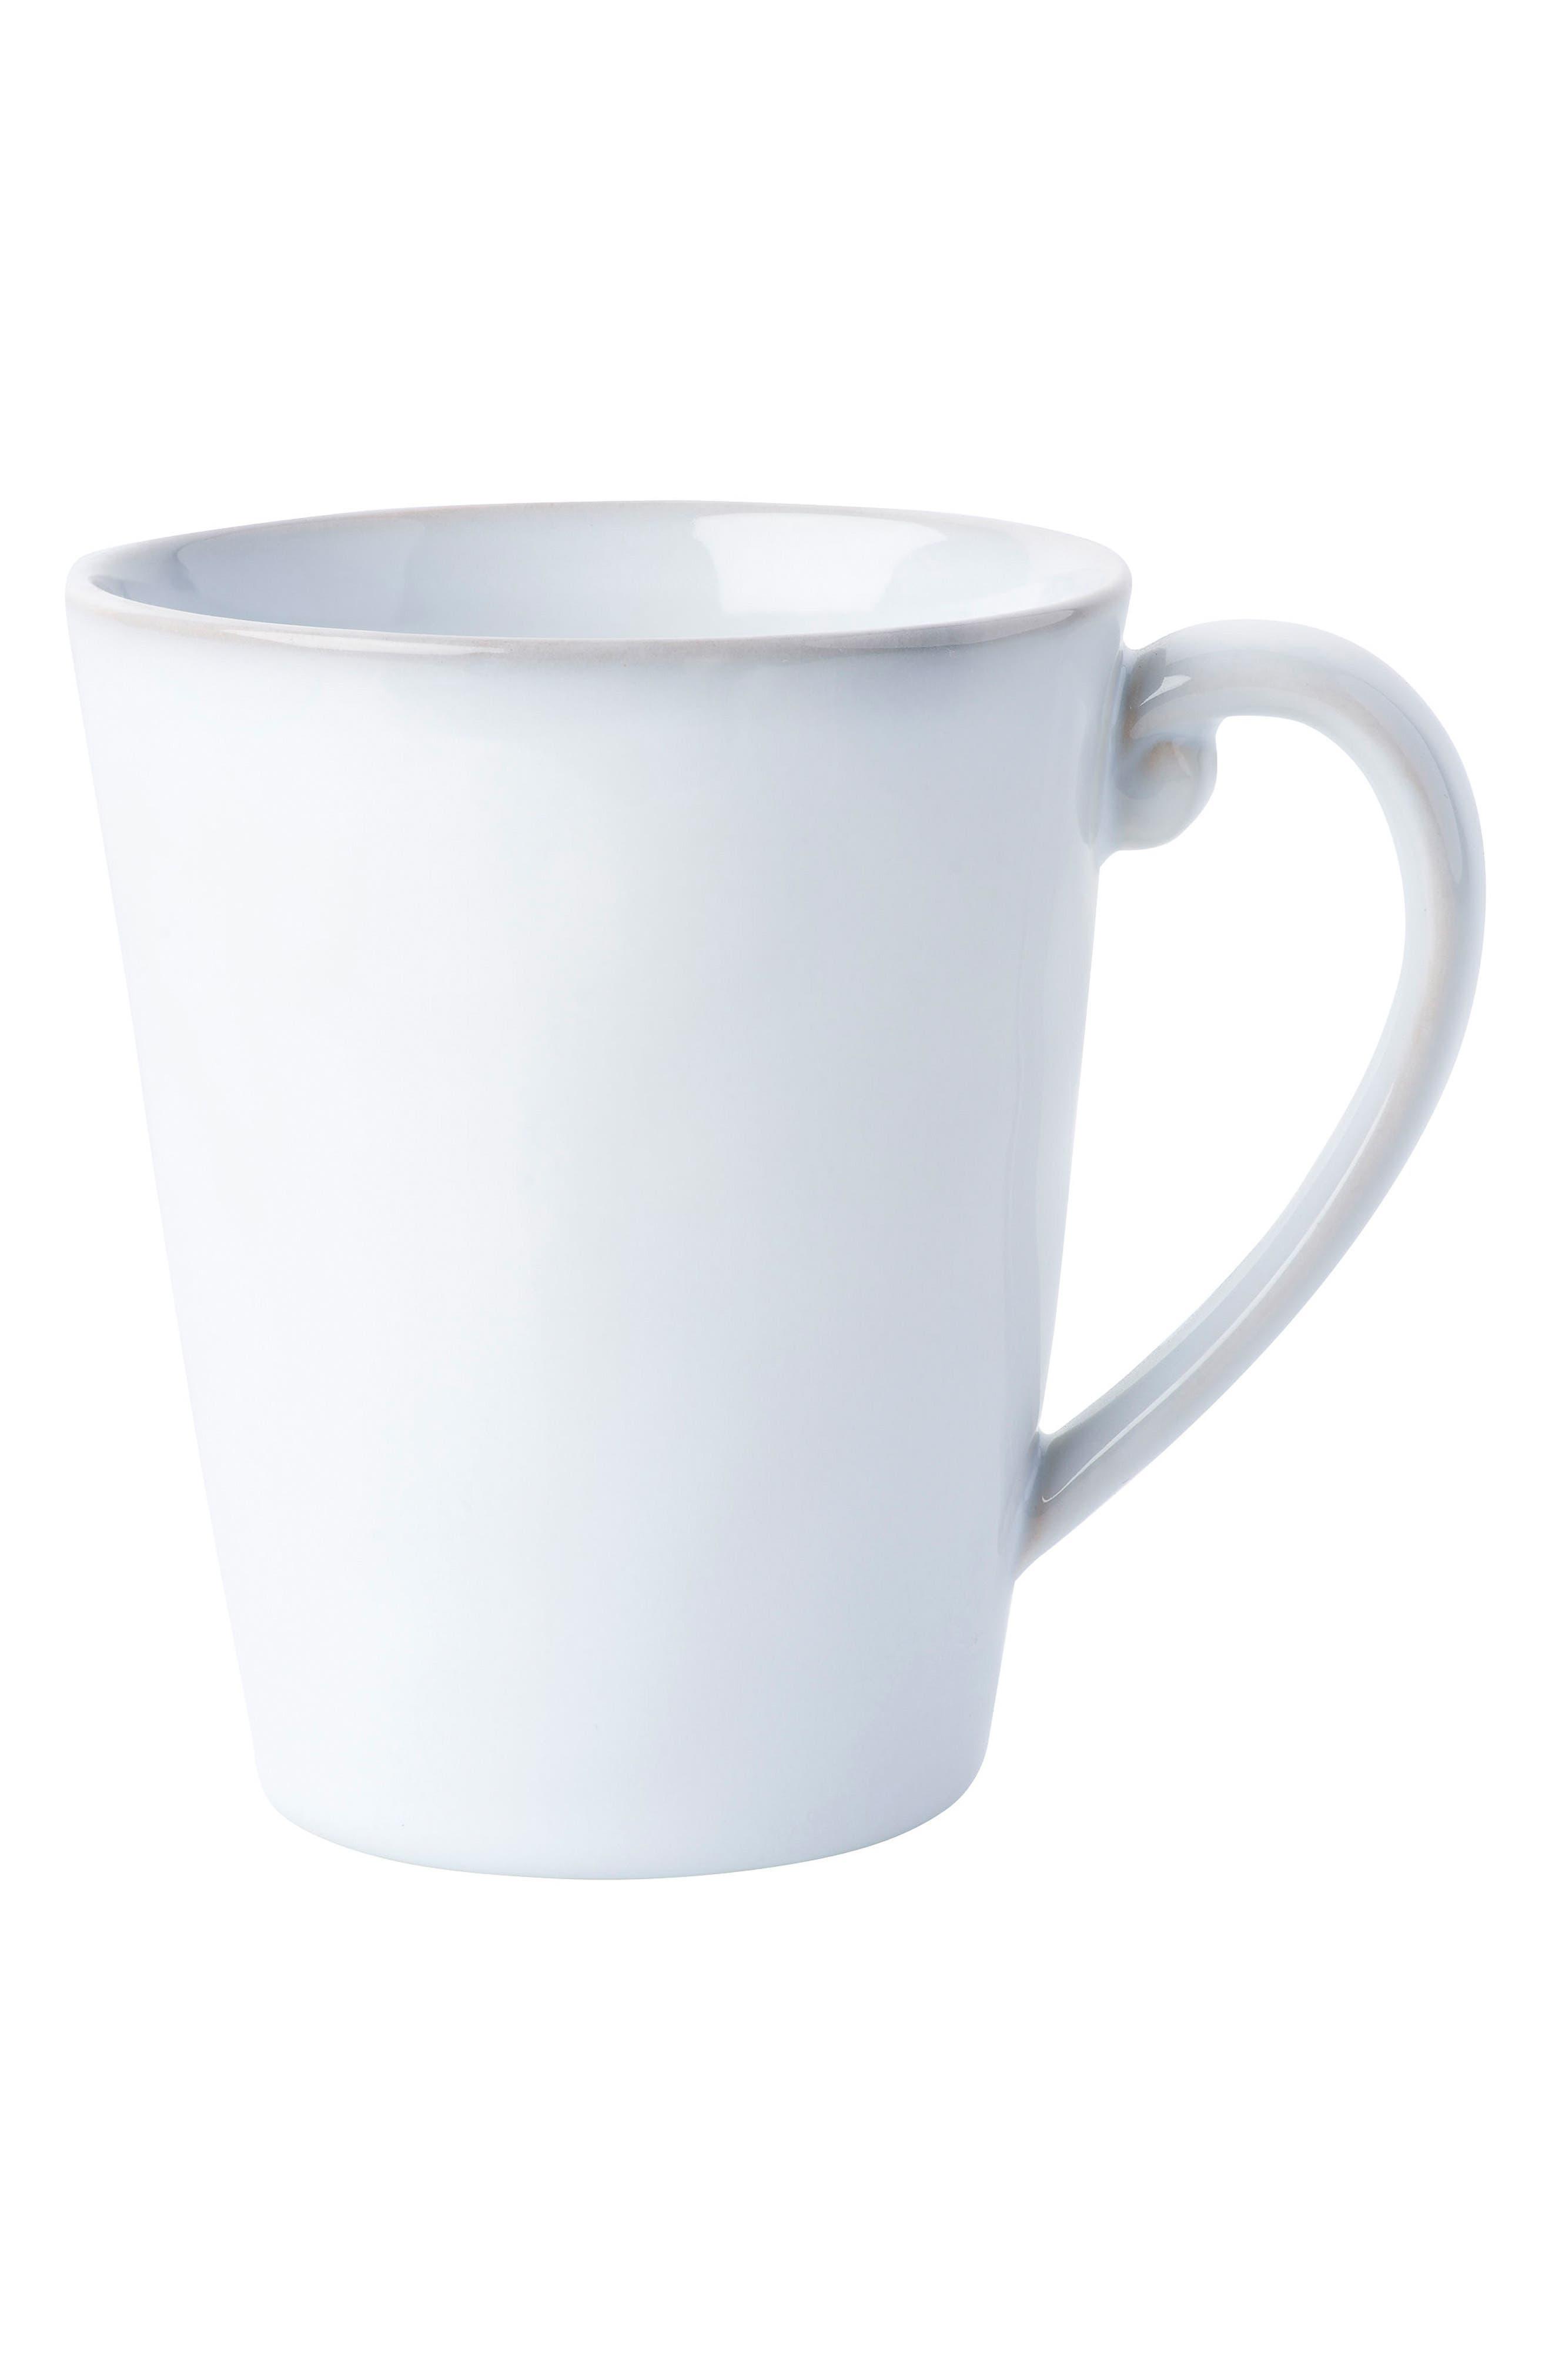 Alternate Image 1 Selected - Juliska Quotidien White Truffle Ceramic Mug